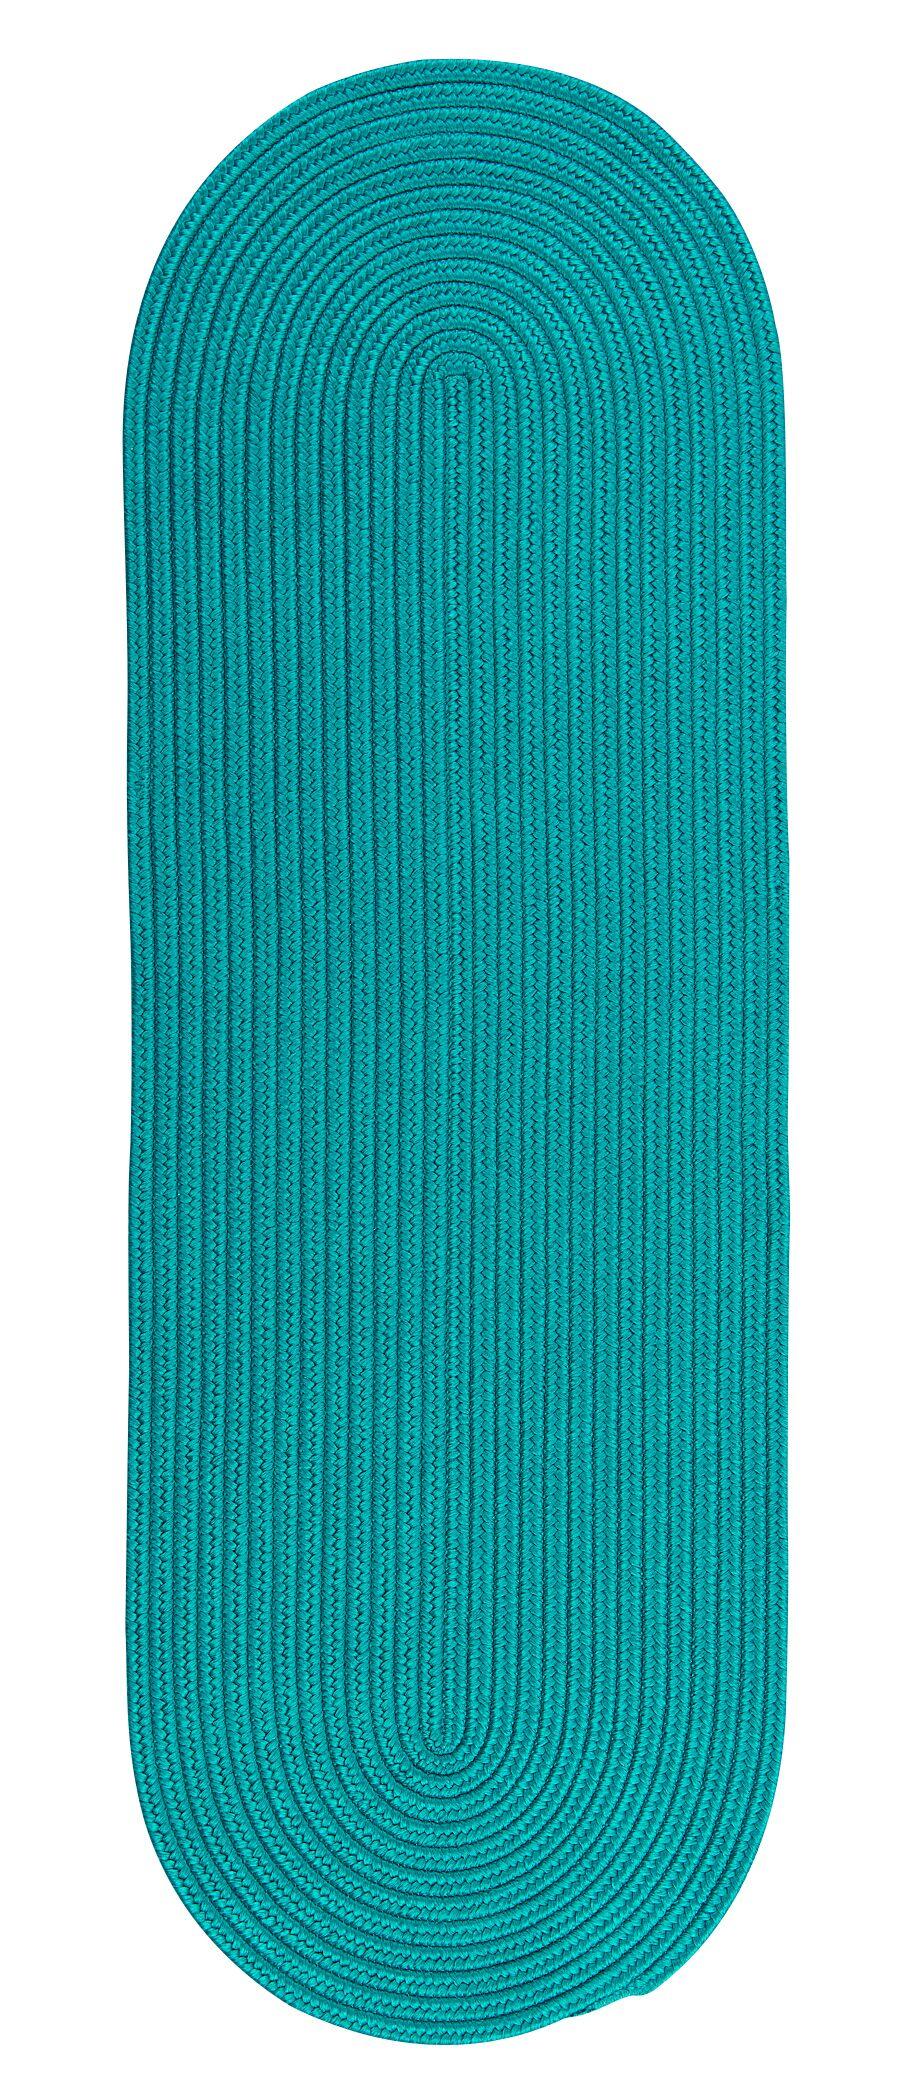 Wembley Reversible Hand-Braided Blue Indoor/Outdoor Area Rug Rug Size: Runner 2'4